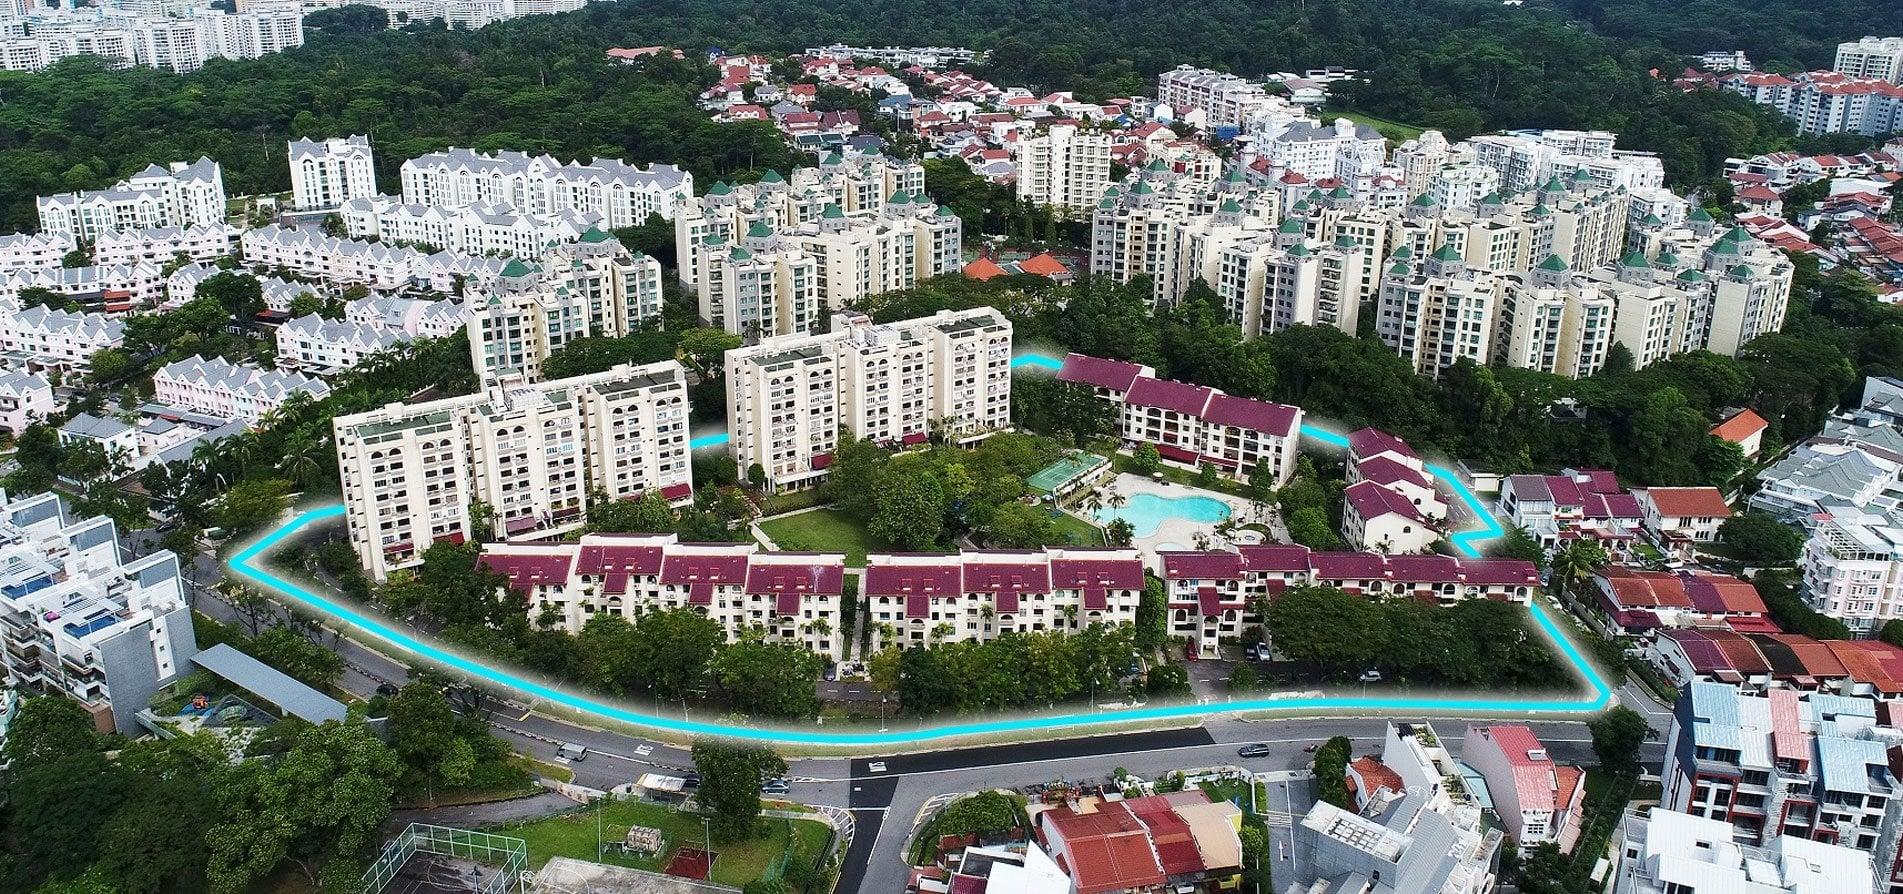 forett-at-bukit-timah-condo-freehold-former-goodluck-garden-singapore